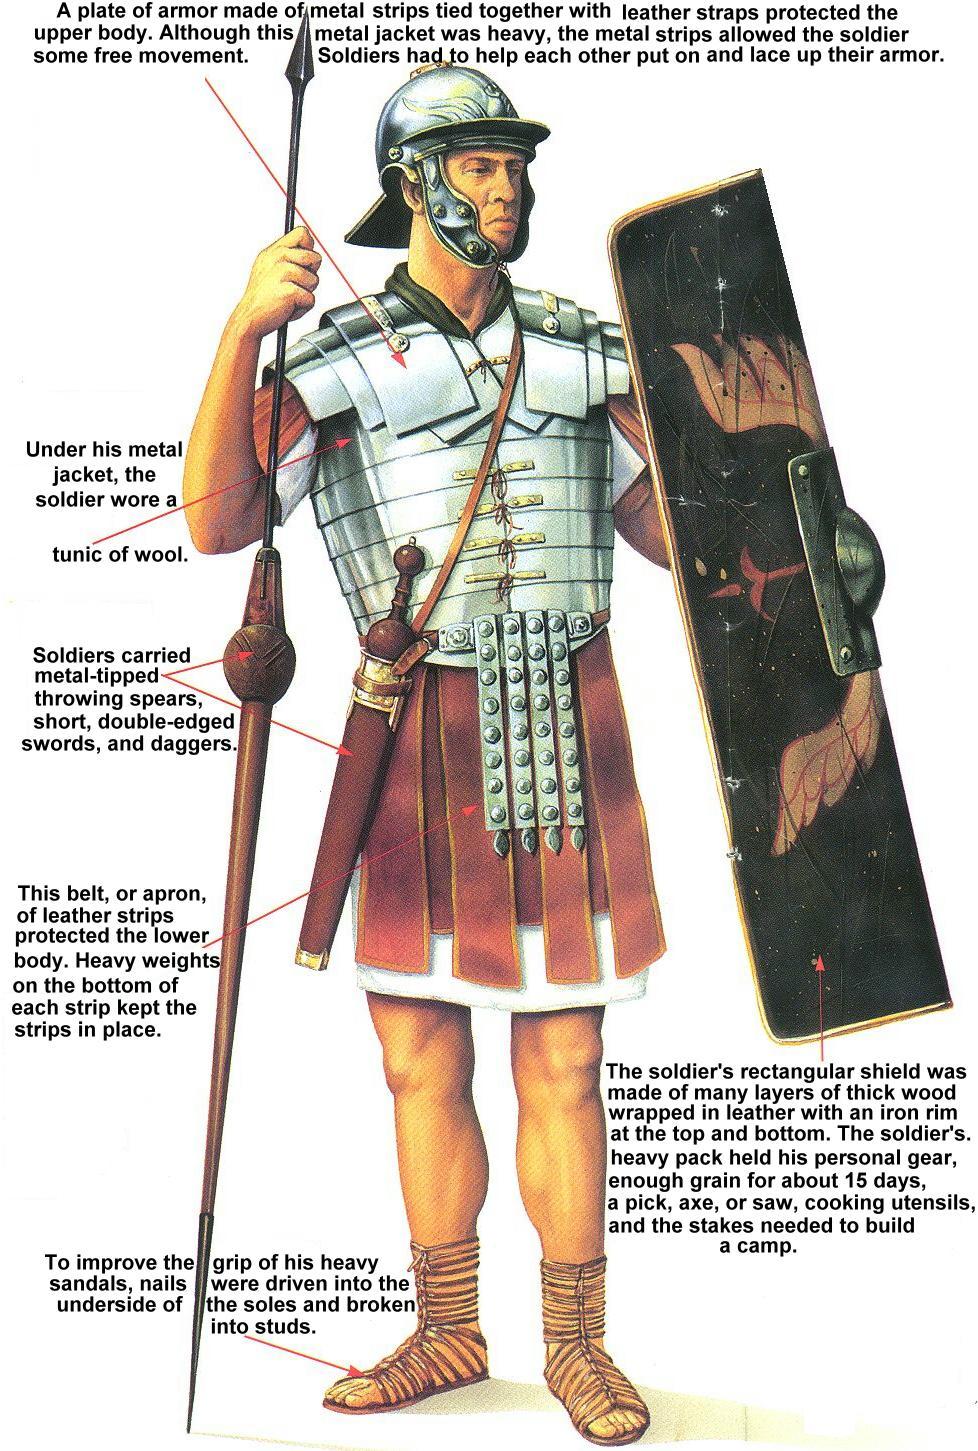 Armor - Roman soldier